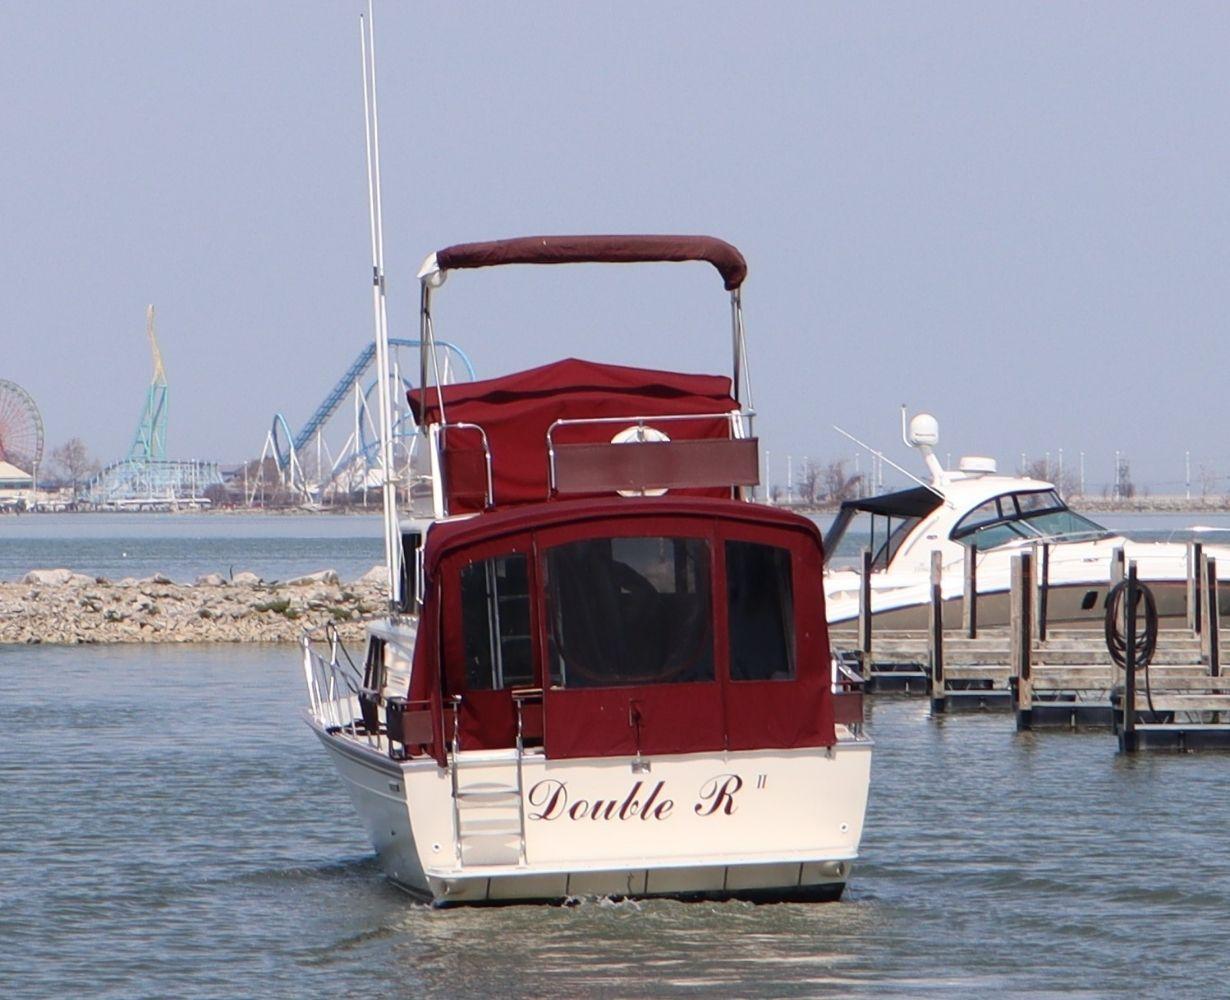 son-rise-marina-sandusky-ohio-gallery-boat-2